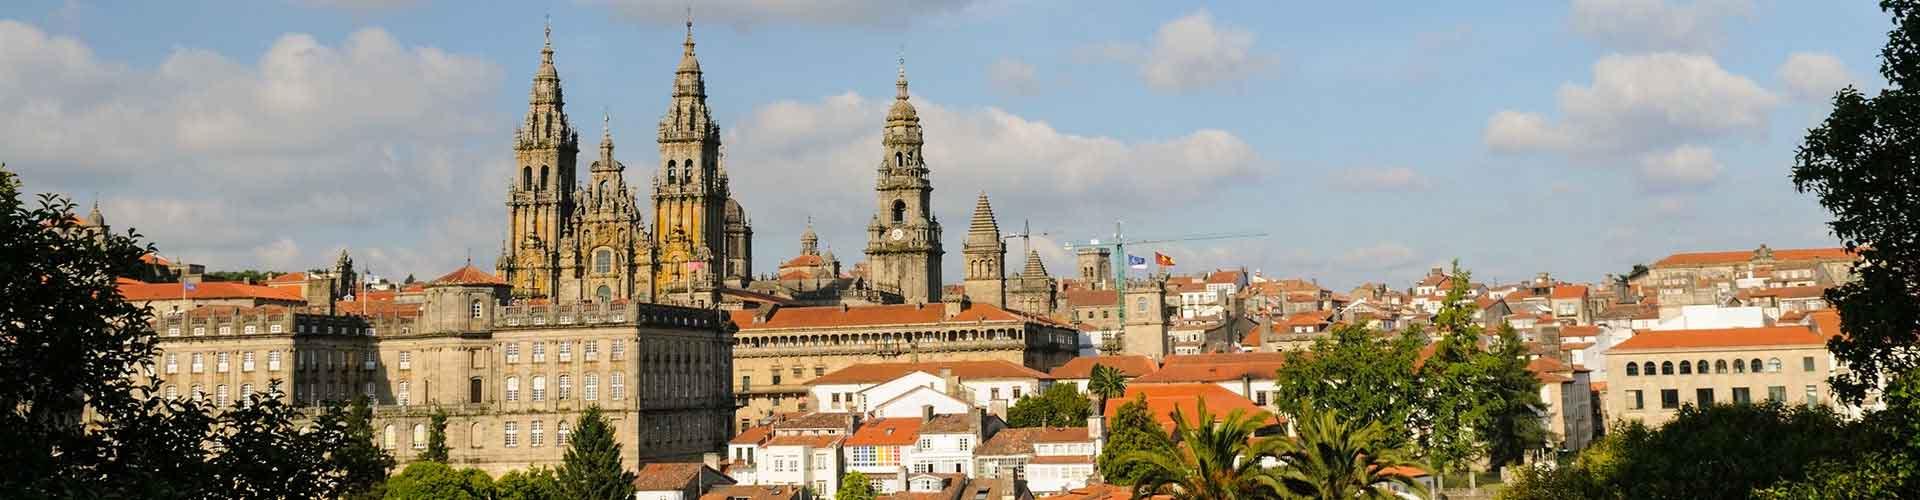 Santiago de Compostela – Hostels in Santiago de Compostela. Karten für Santiago de Compostela. Fotos und Bewertungen für jedes Hostel in Santiago de Compostela.